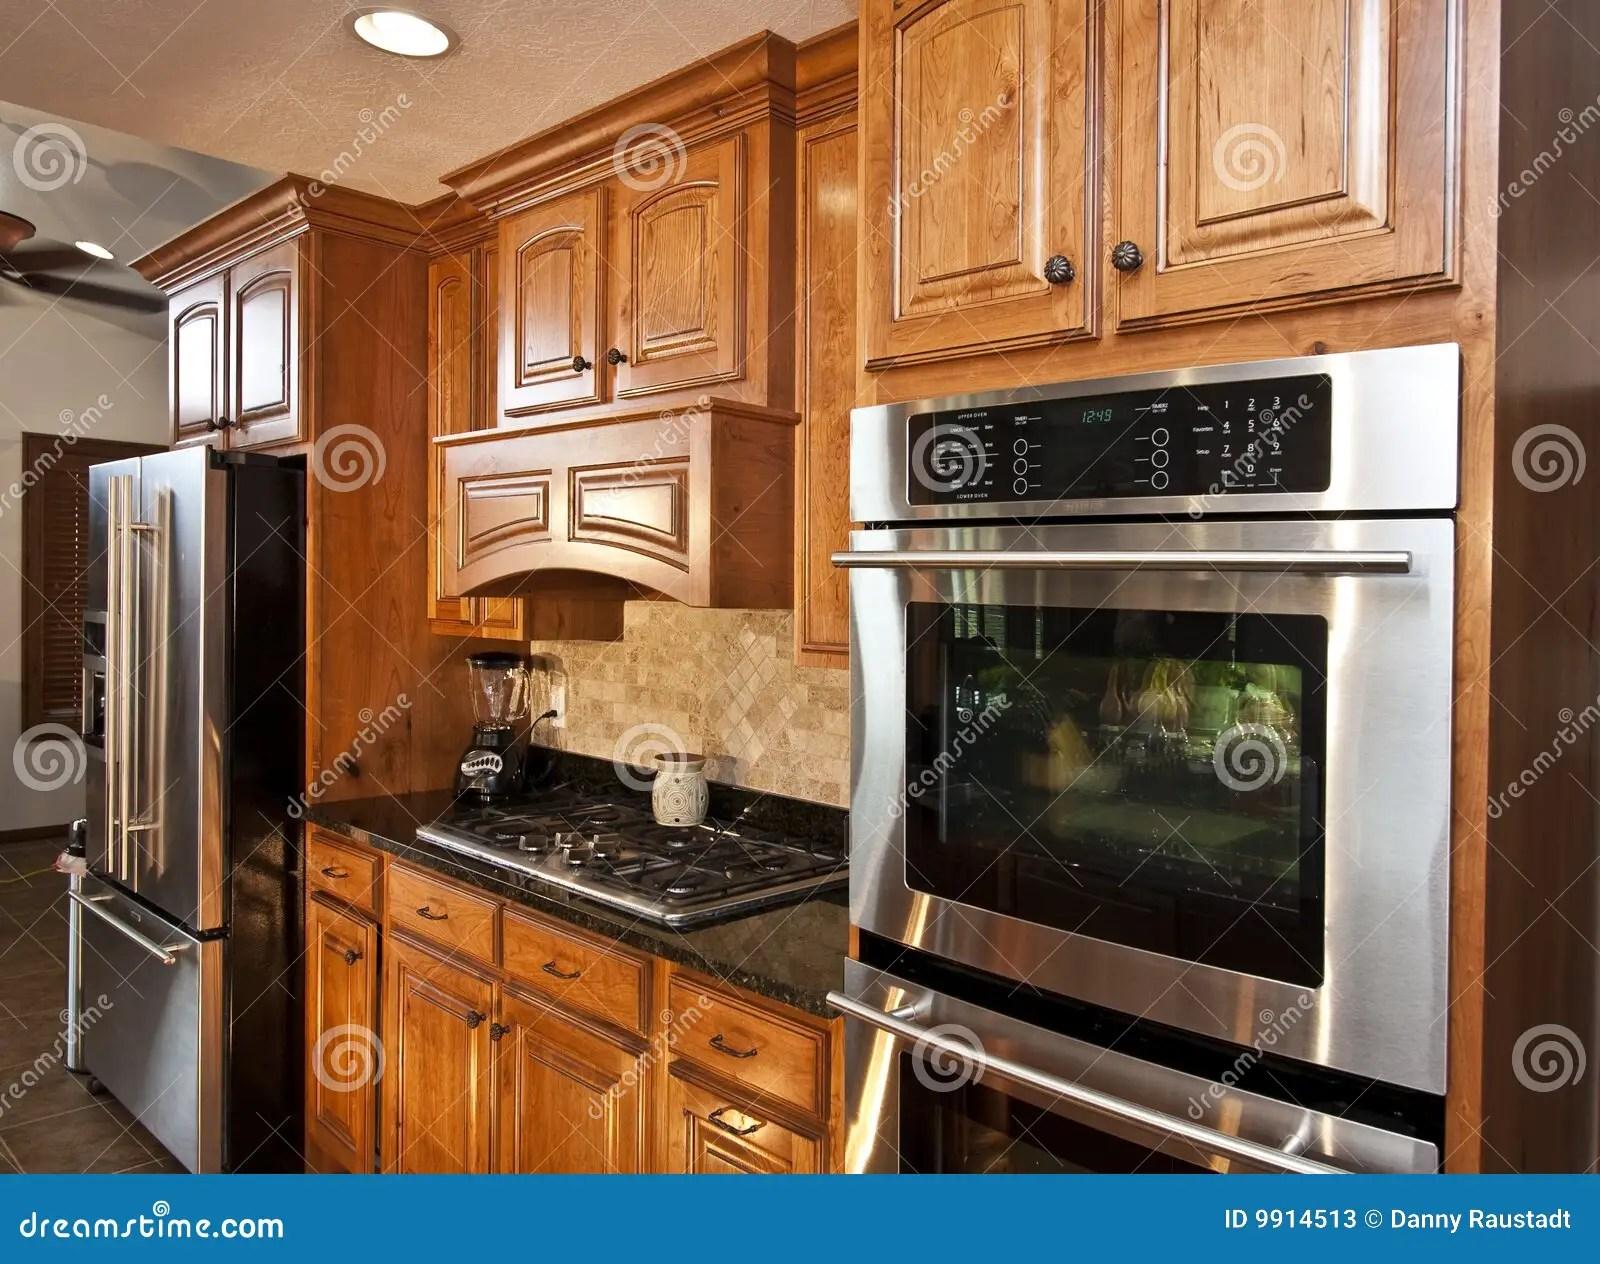 modern kitchen appliances towel bars new stock image 9914513